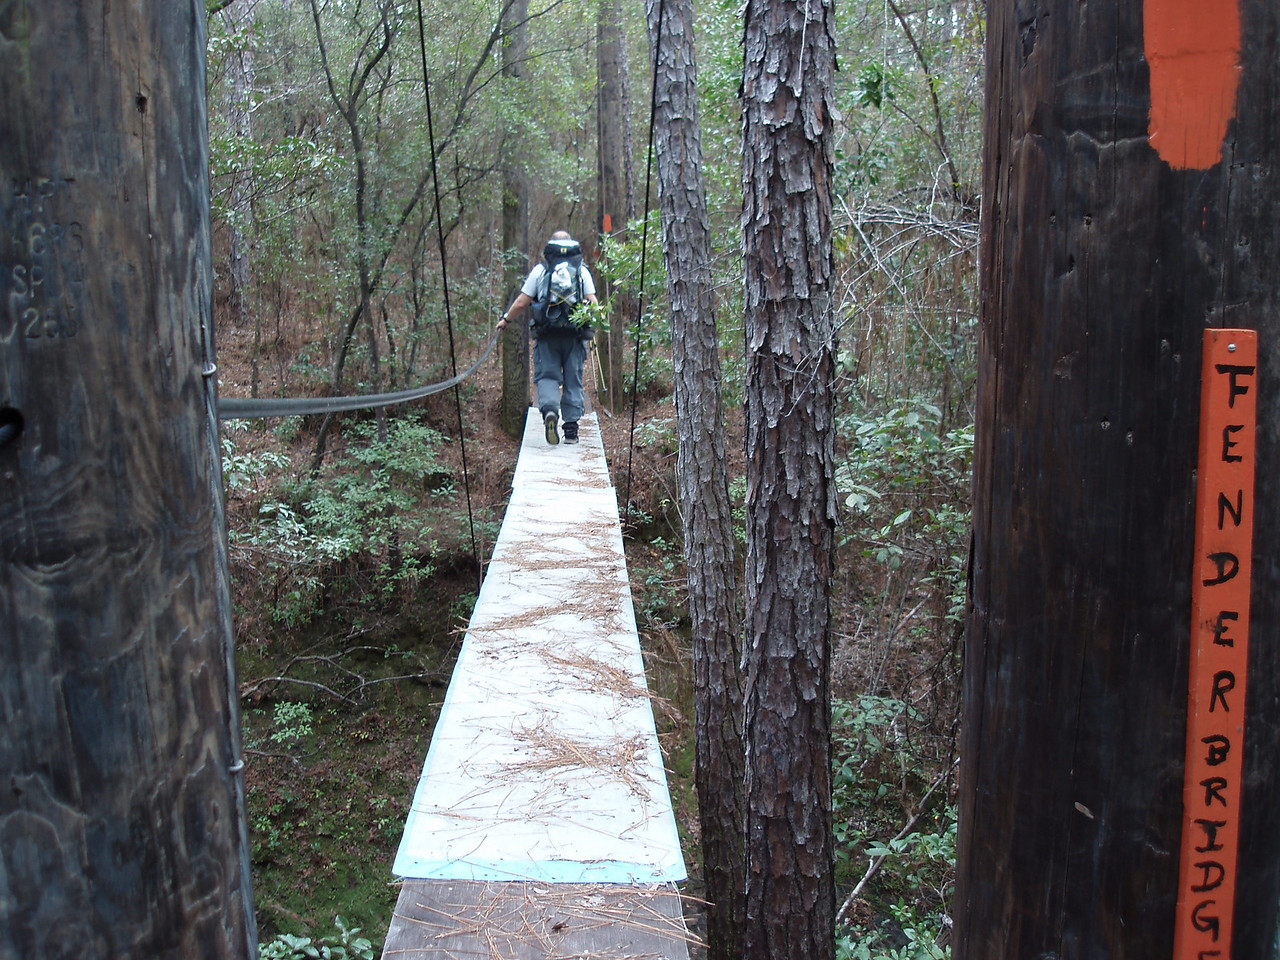 Fender Bridge over Econfina Creek<br /> PHOTO CREDIT: Robert Coveney / Florida Trail Association